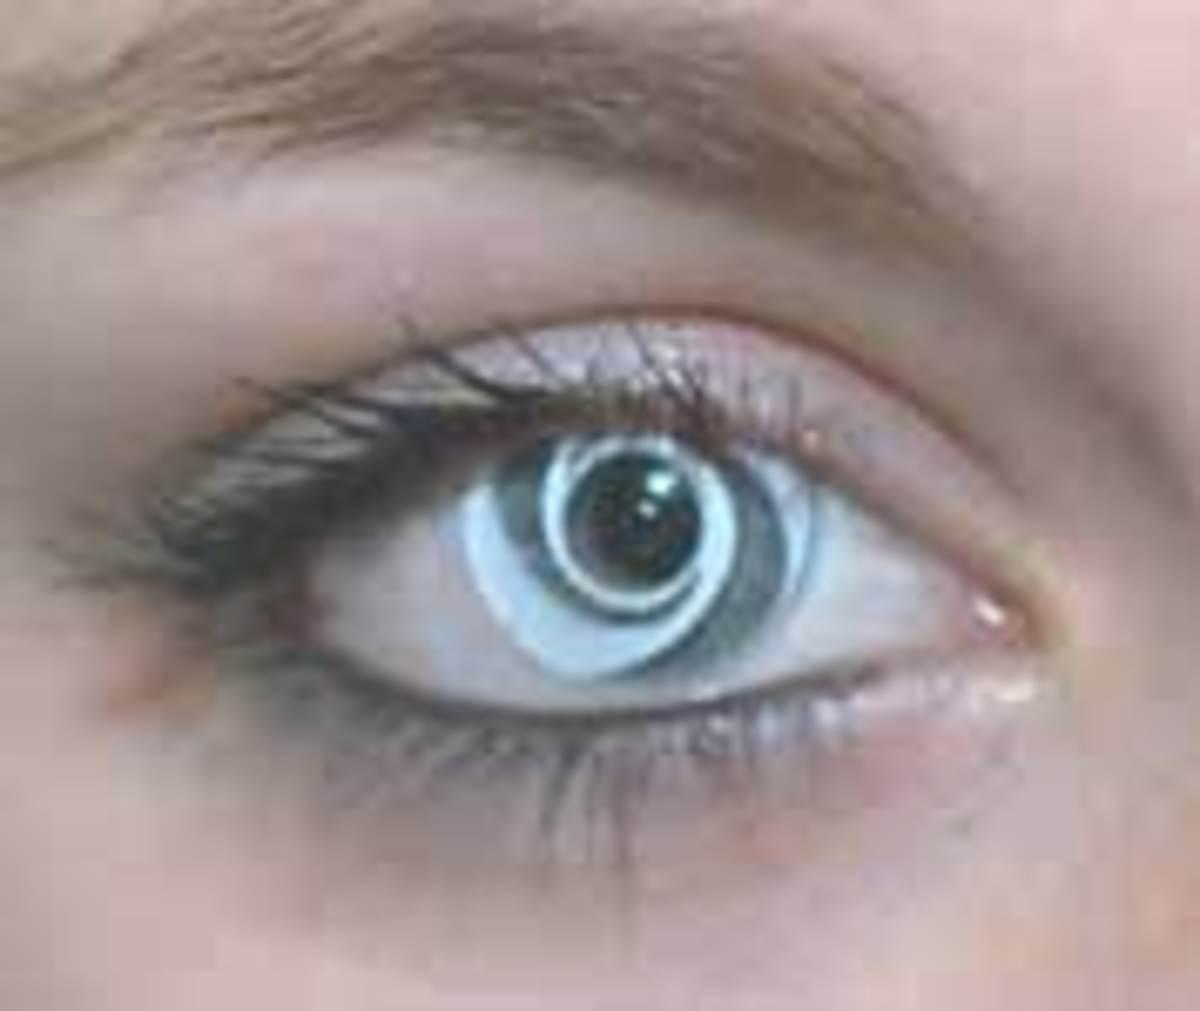 A fantasy swirl contact lens